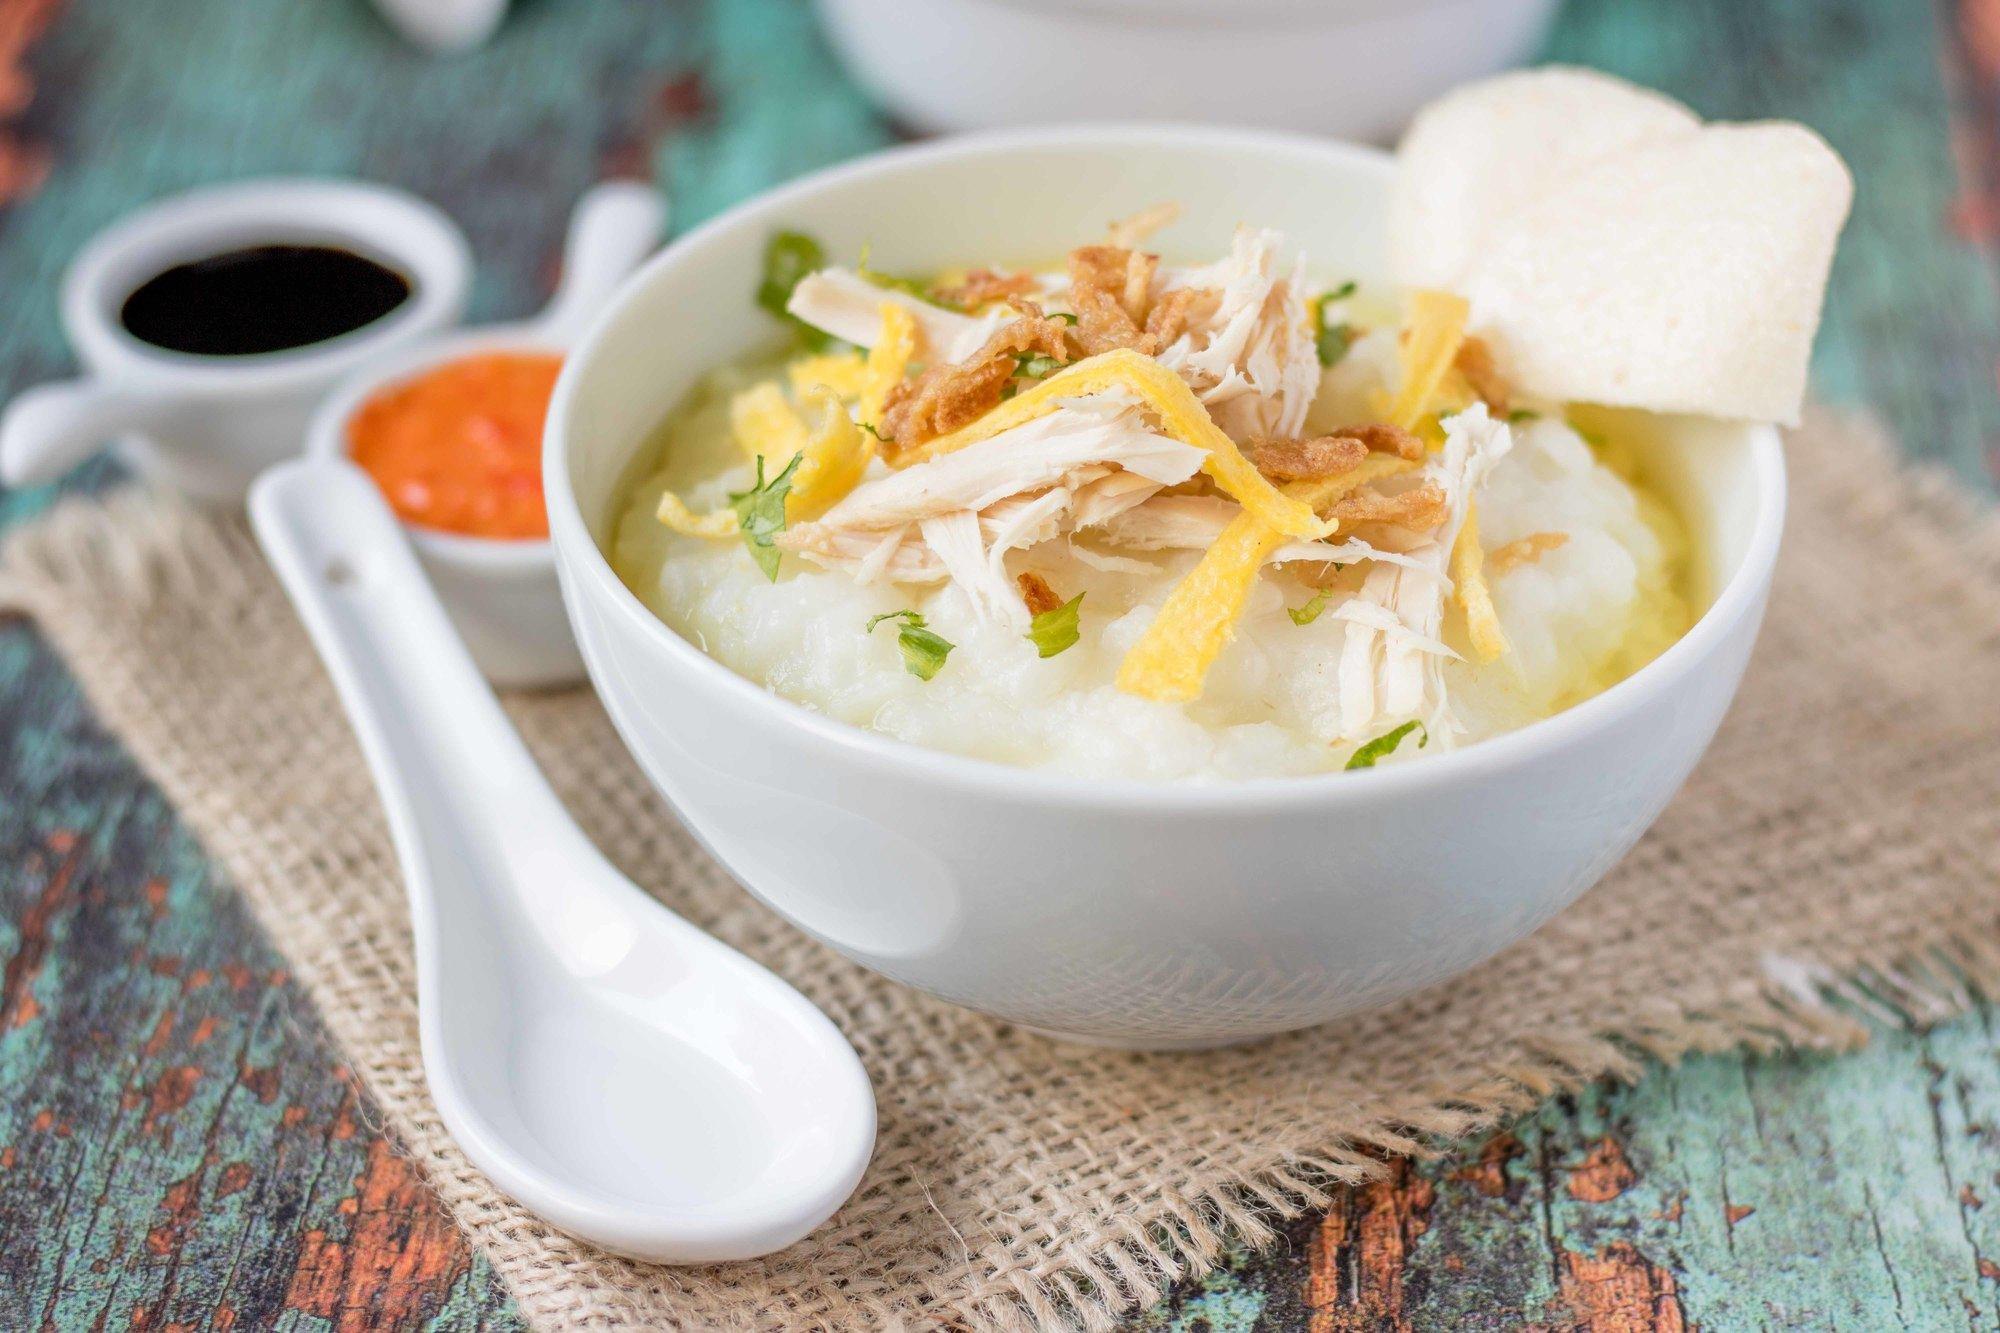 Resep Bubur Ayam Kuning